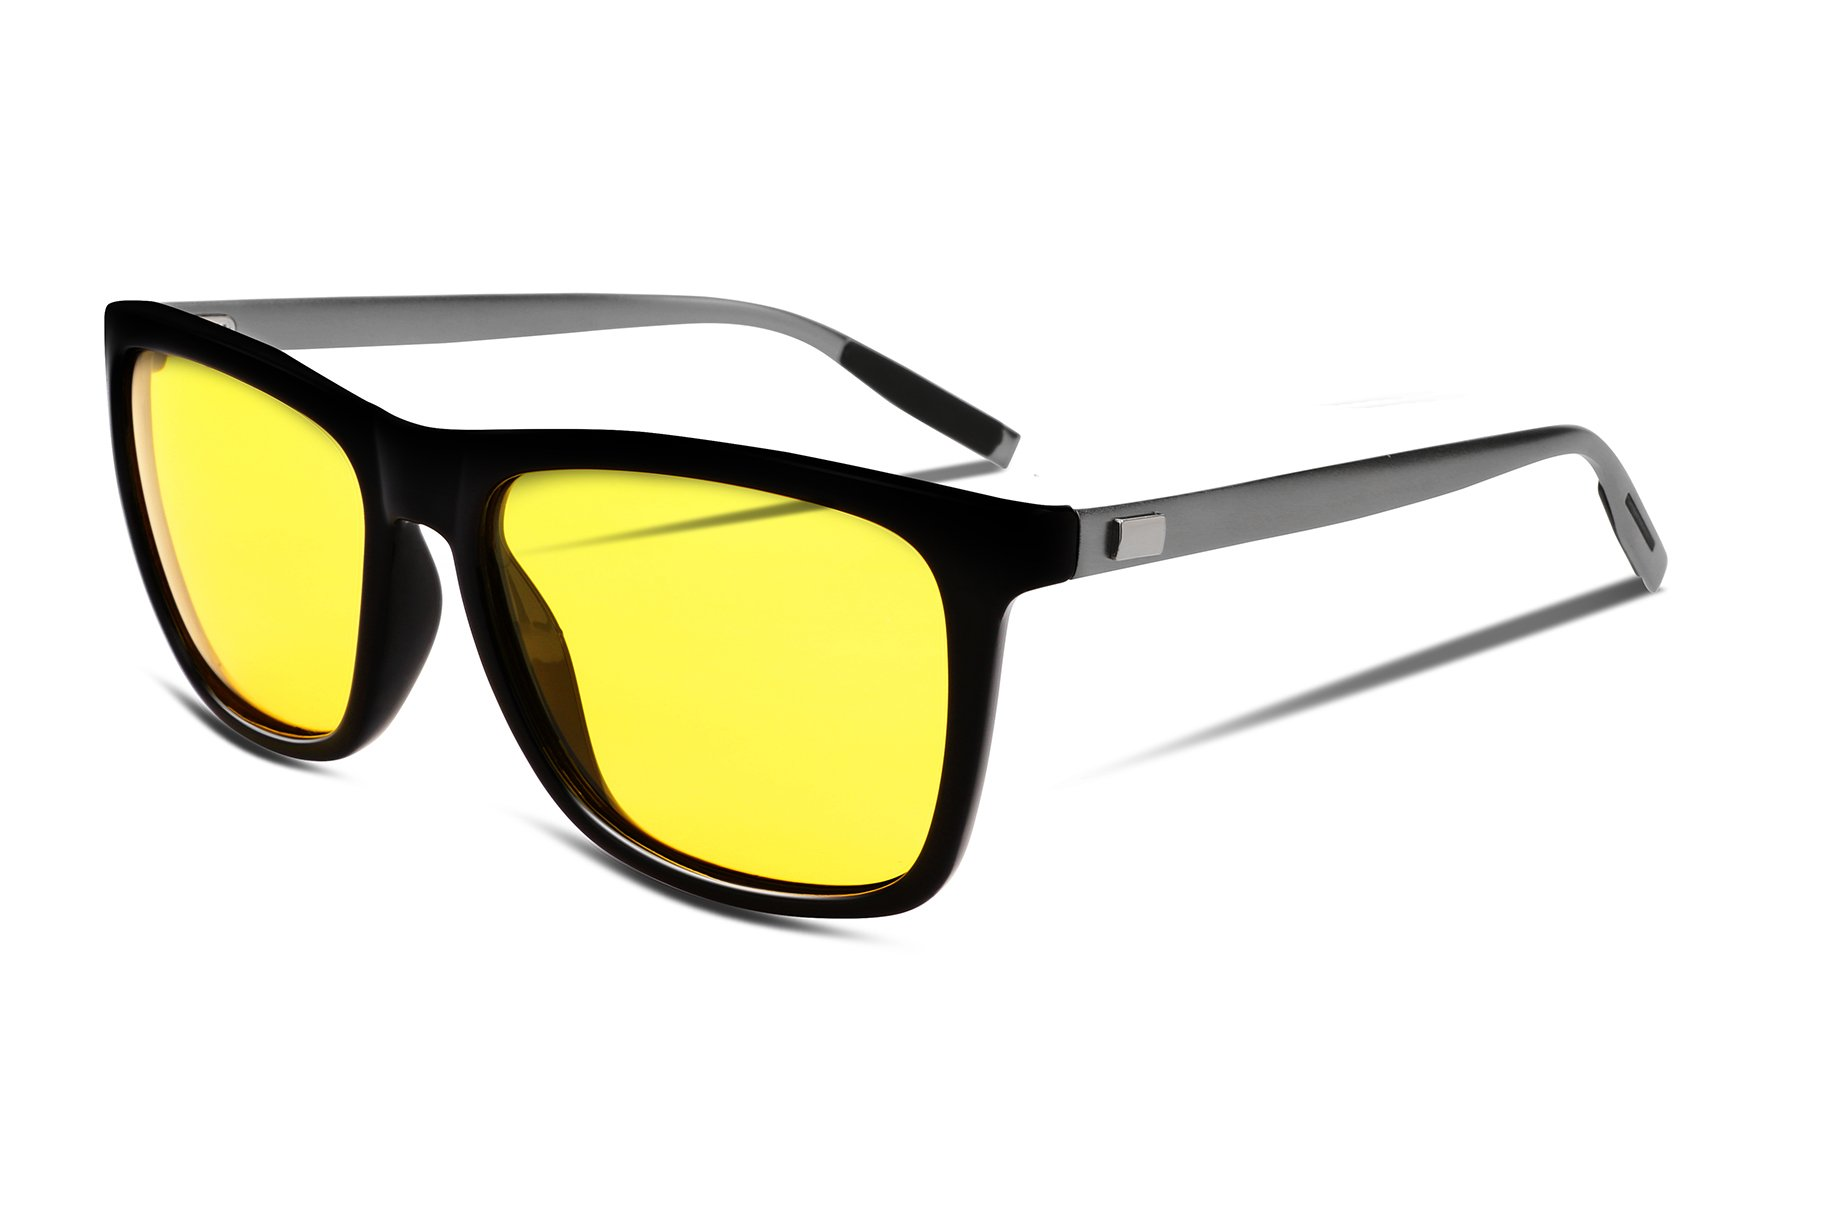 FEISEDY Night Vision HD Driving Glasses Mens Polarized Anti-Glare Eyewear B2293